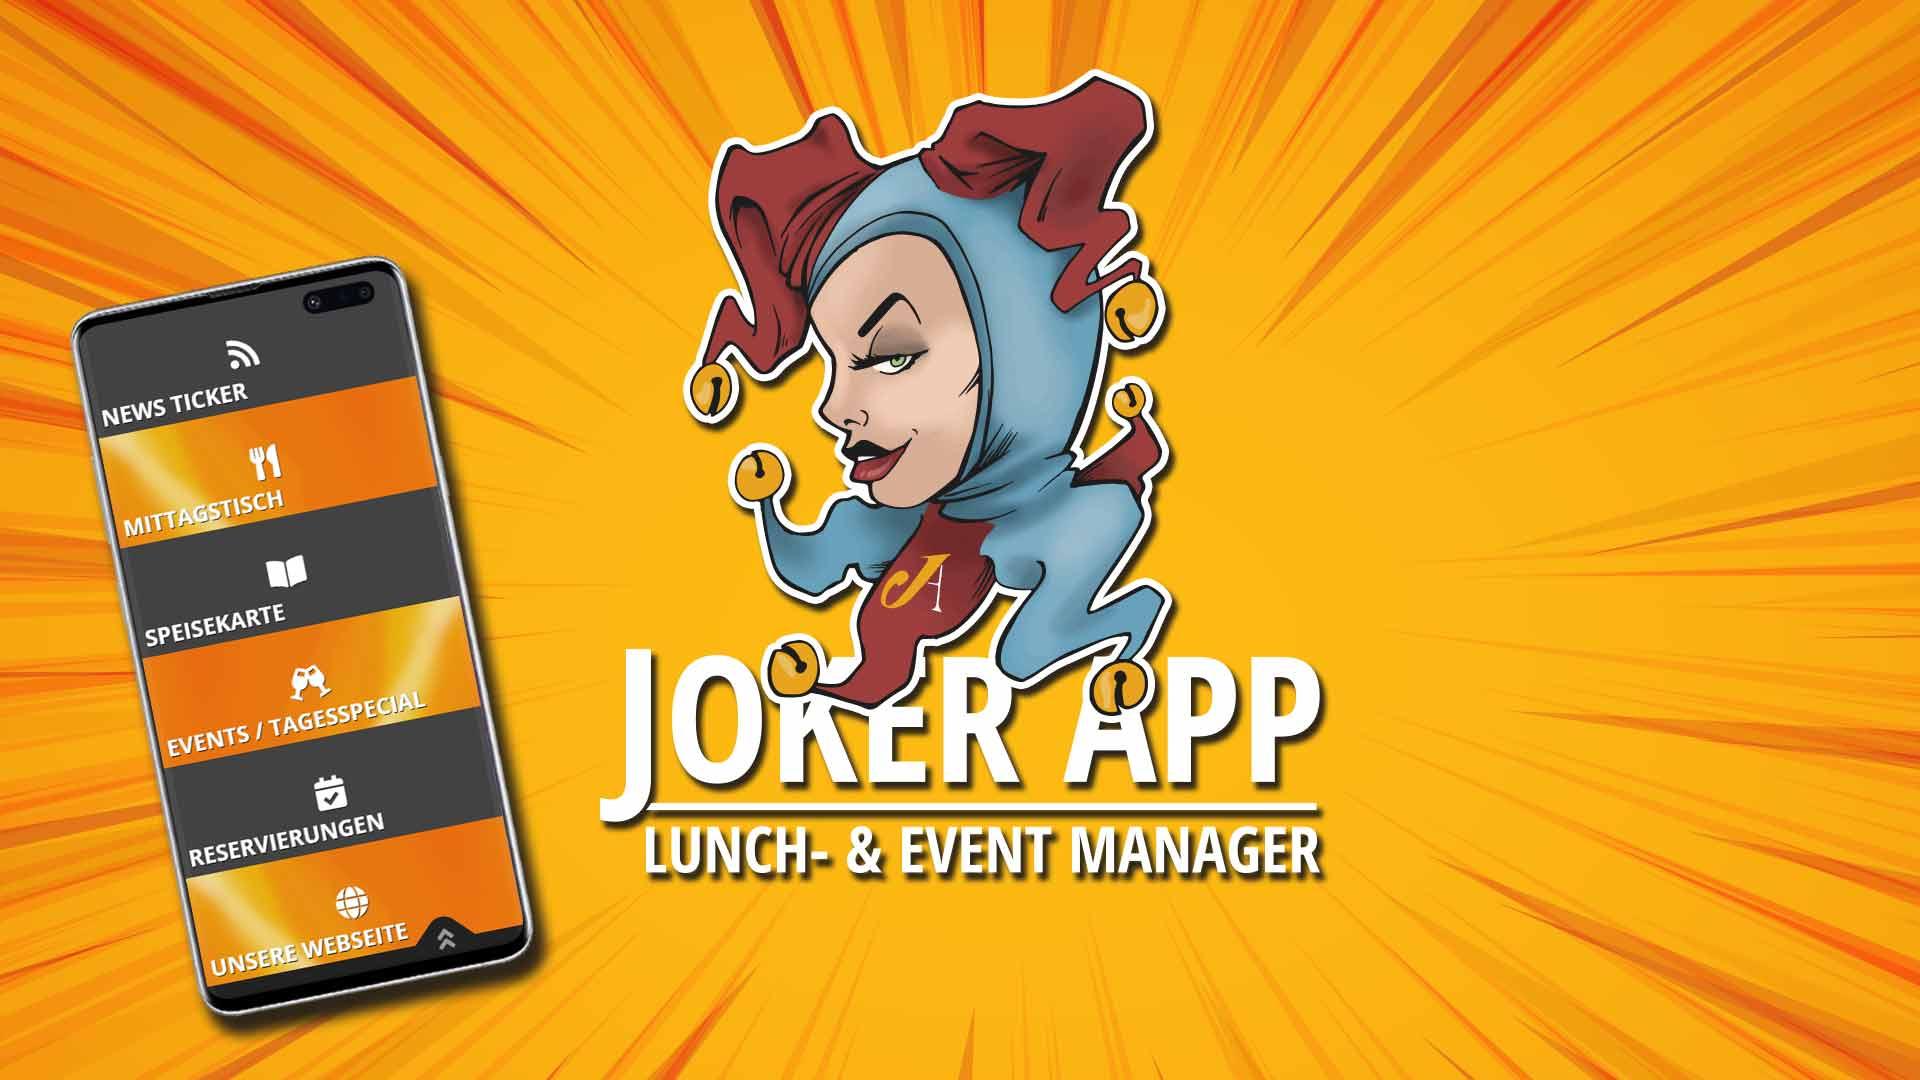 JOKER APP - Der Lunch/Event-Manager